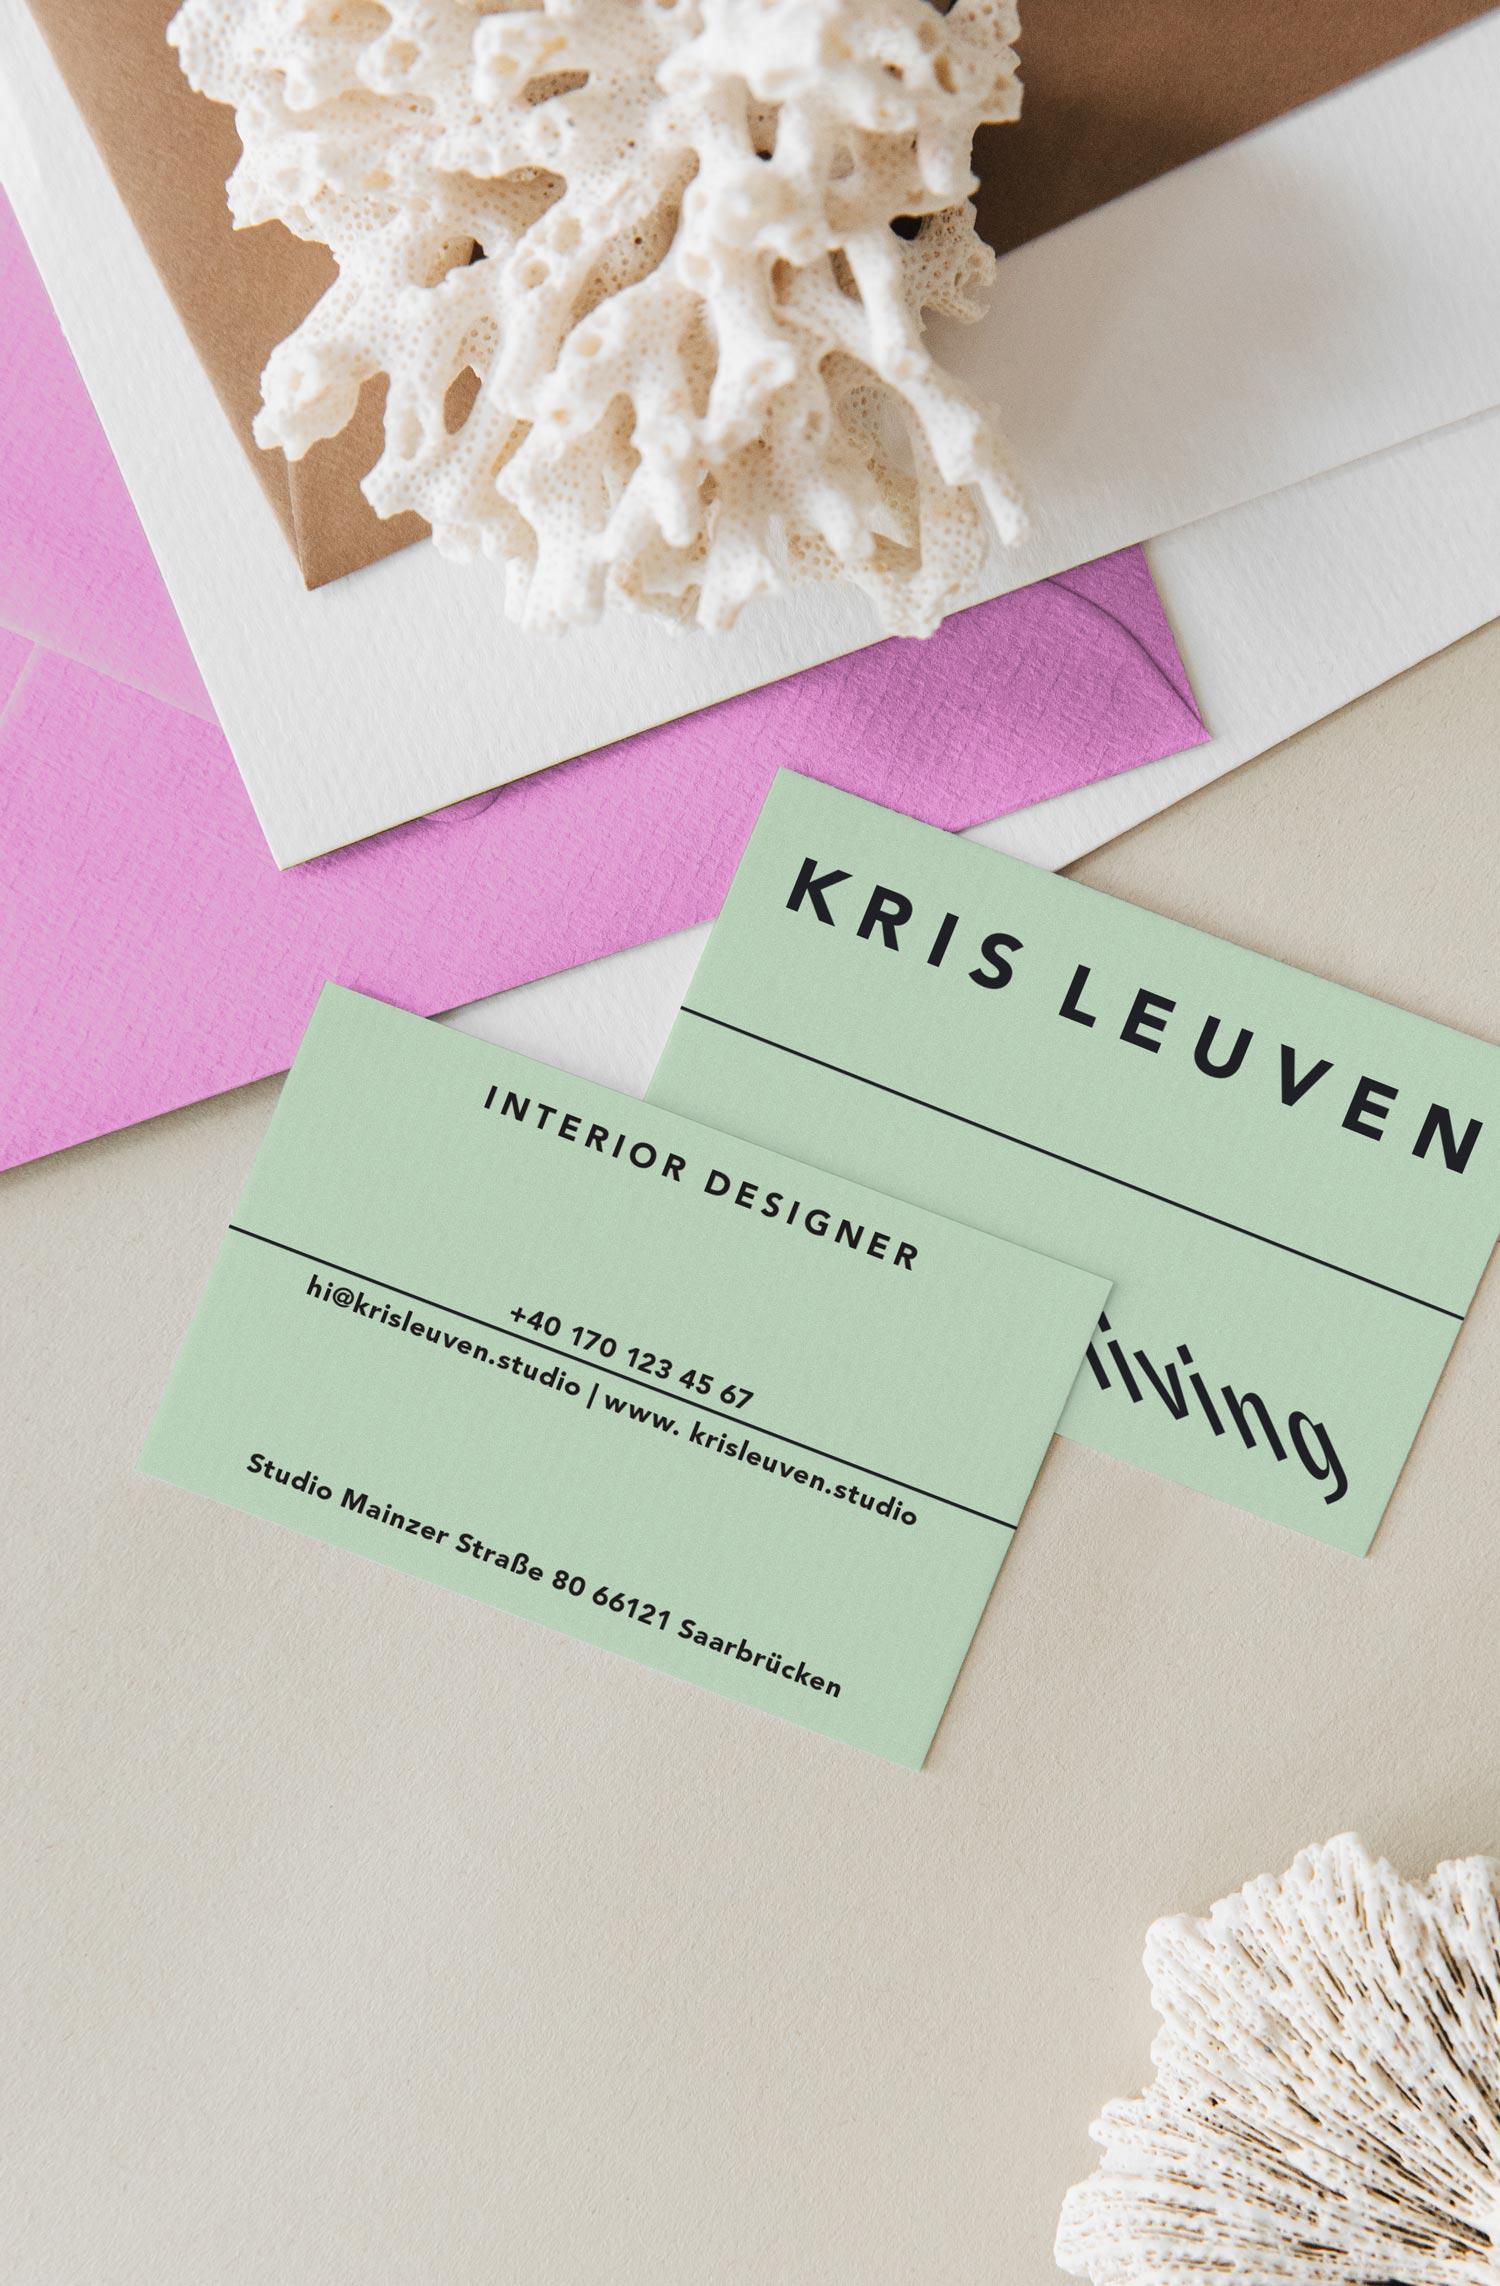 Kris Leuven Interior Designer Branding + Business Card Print Design